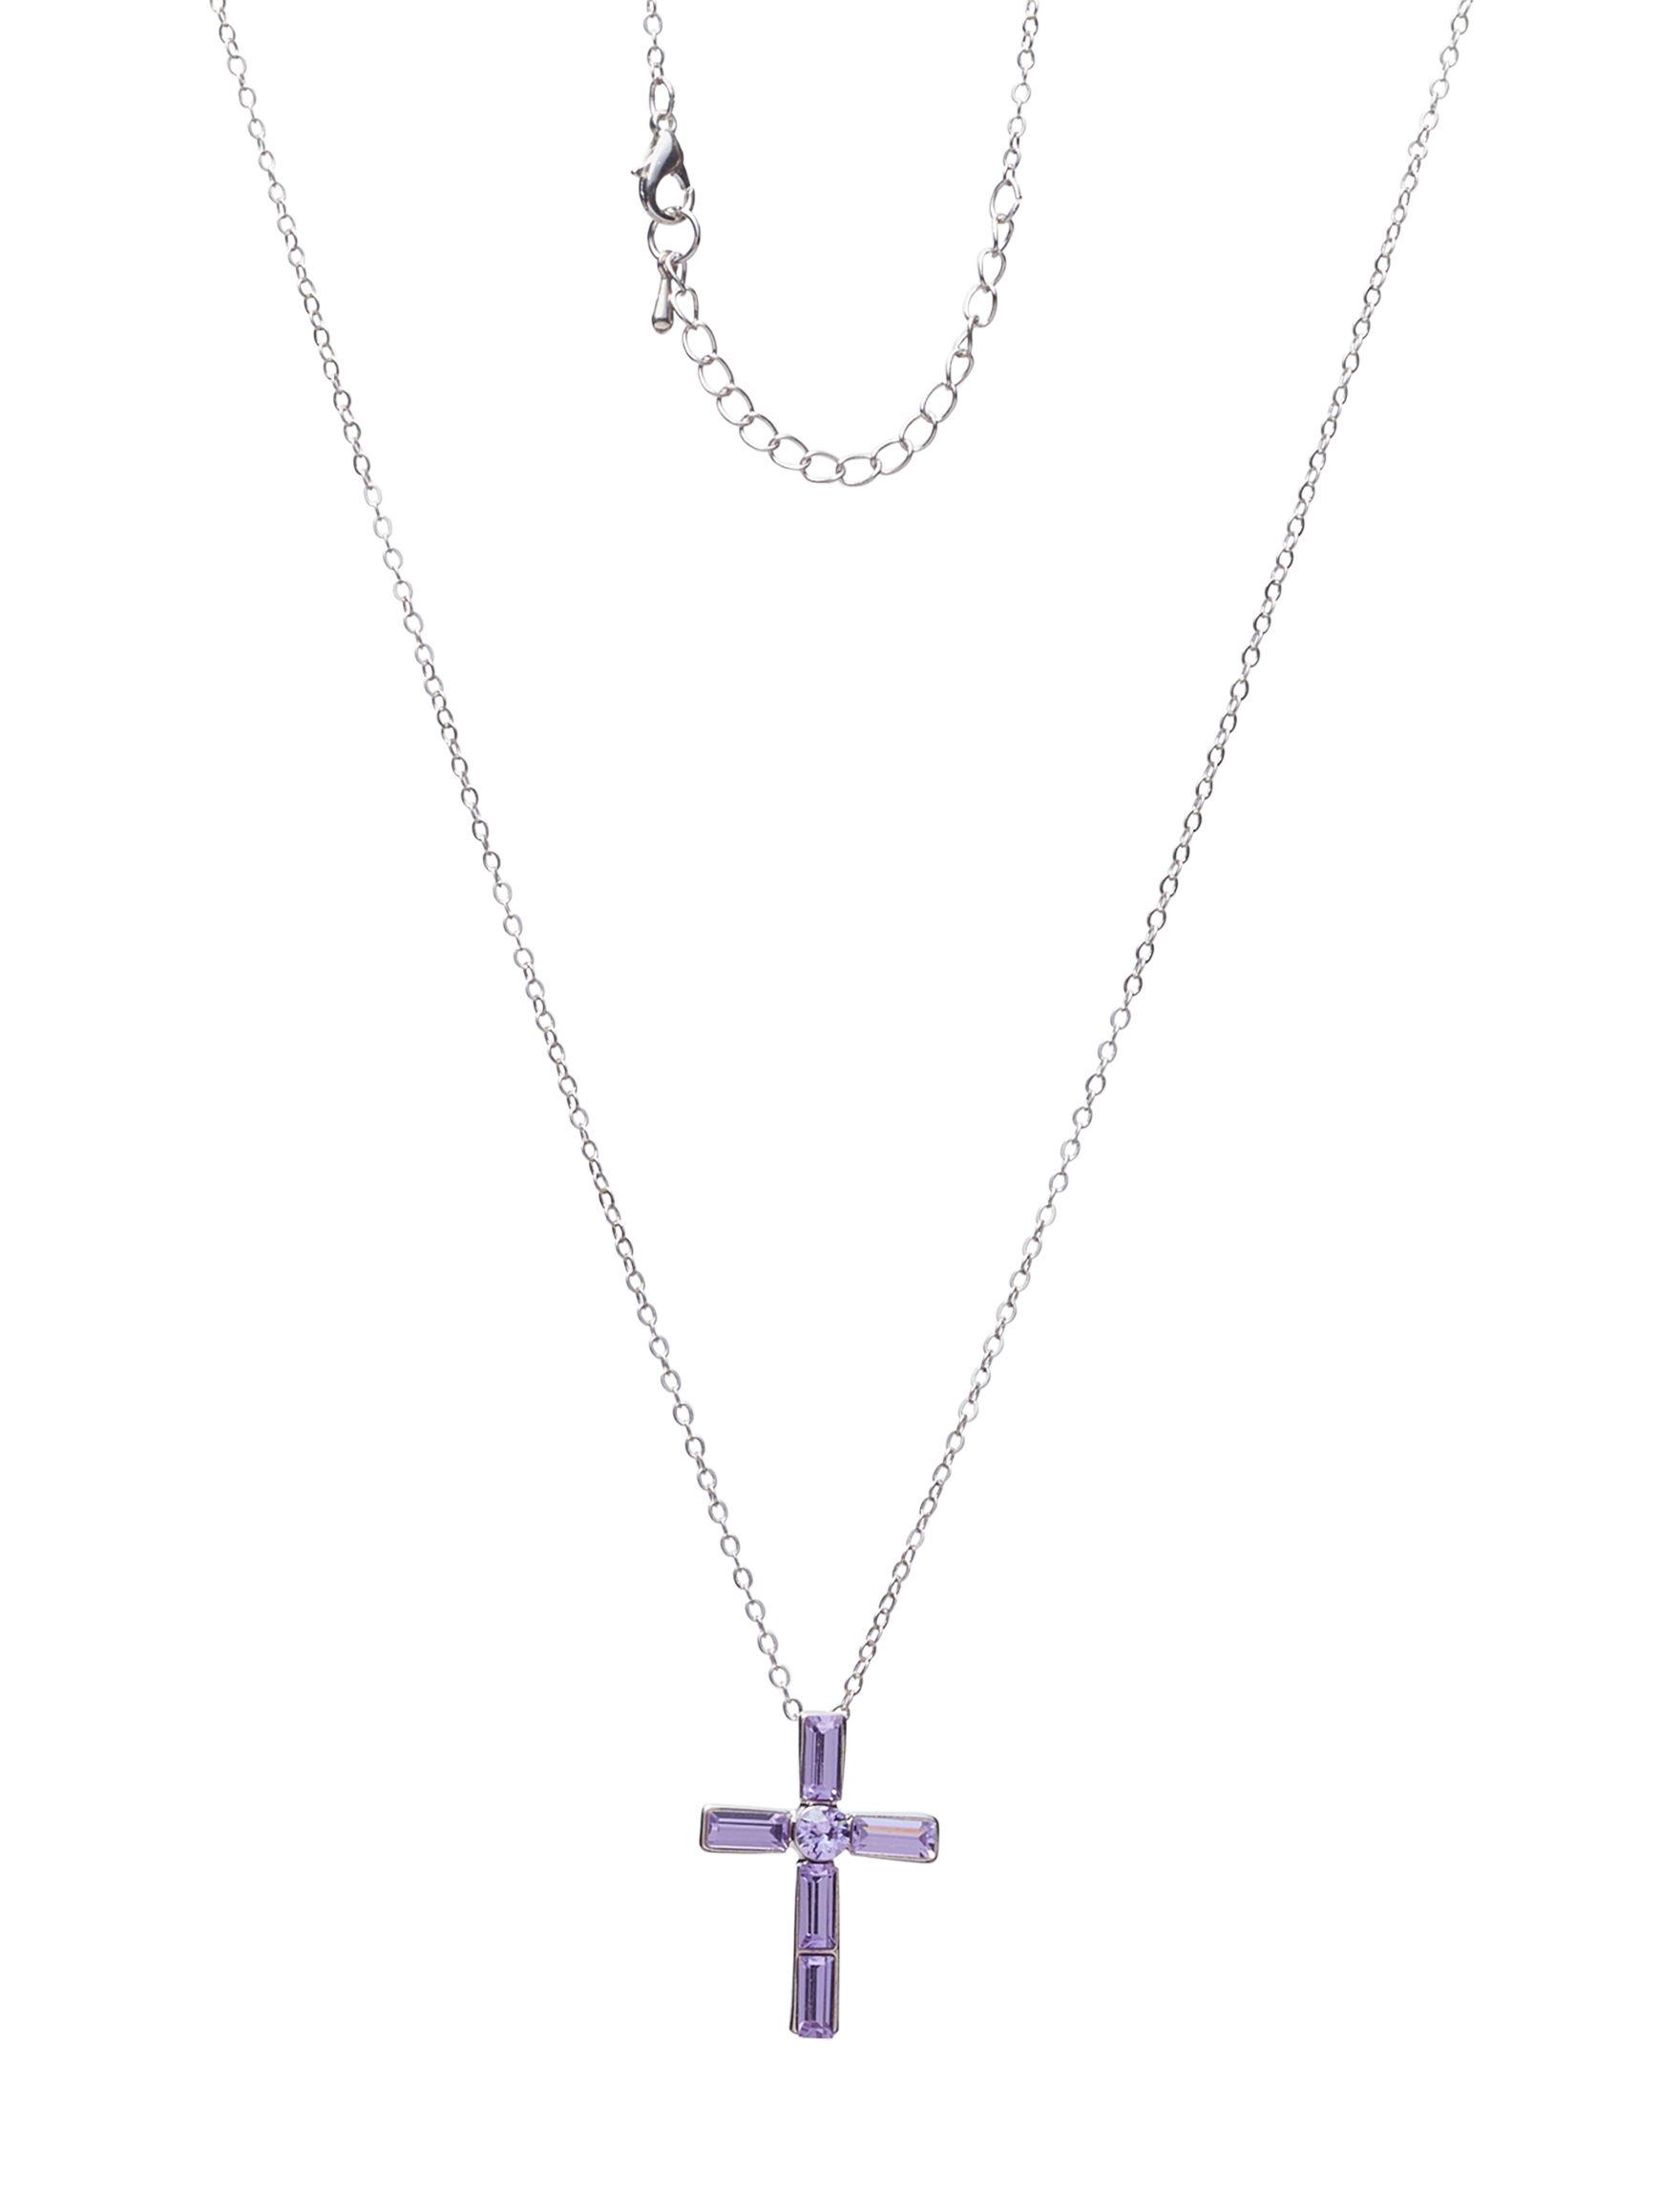 NES Silver / Purple Stone Necklaces & Pendants Fine Jewelry